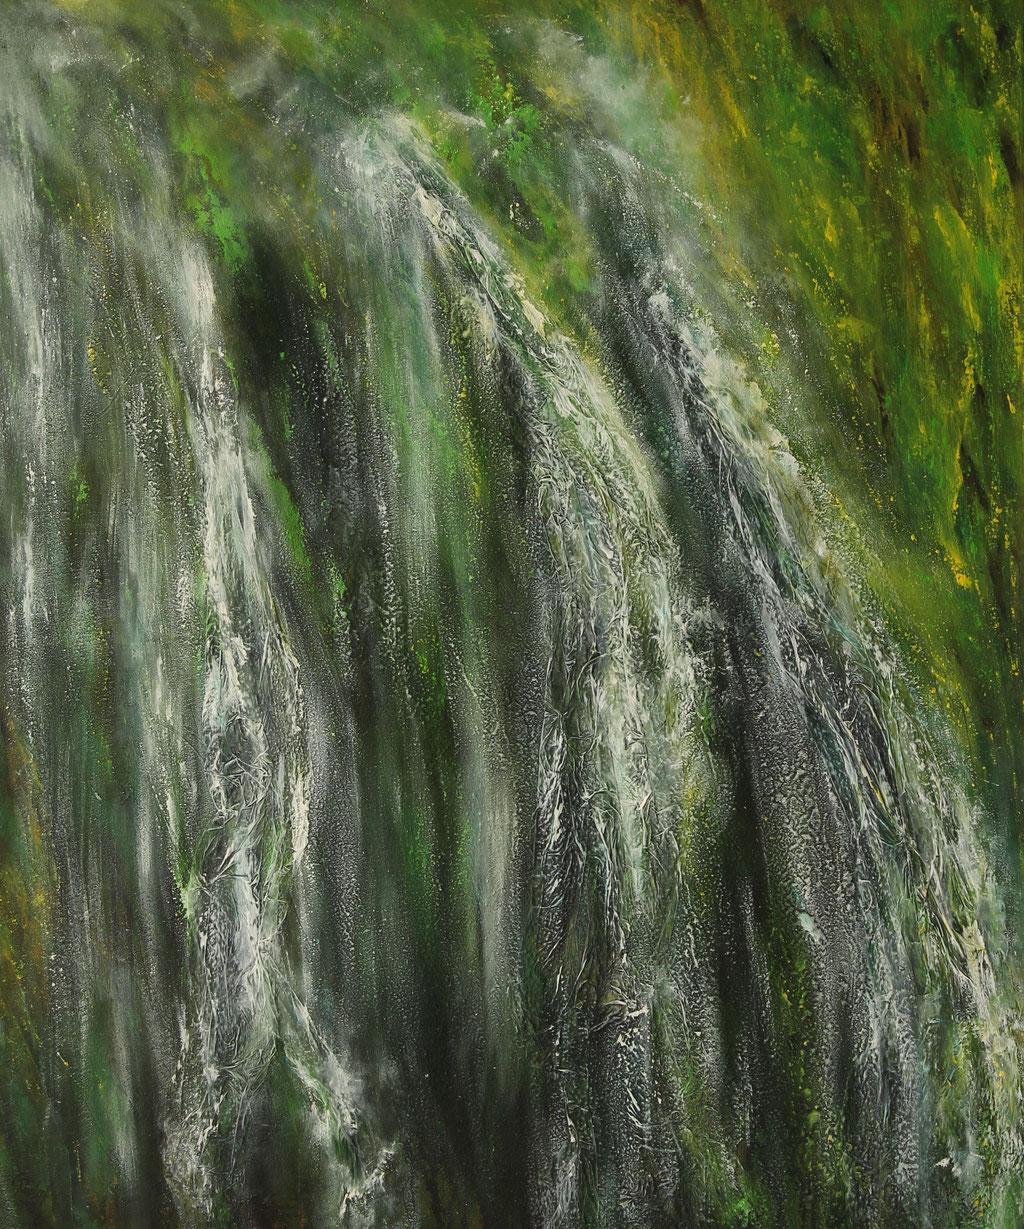 Wasserfall | Acrylmischtechnik | 120cm x 100cm